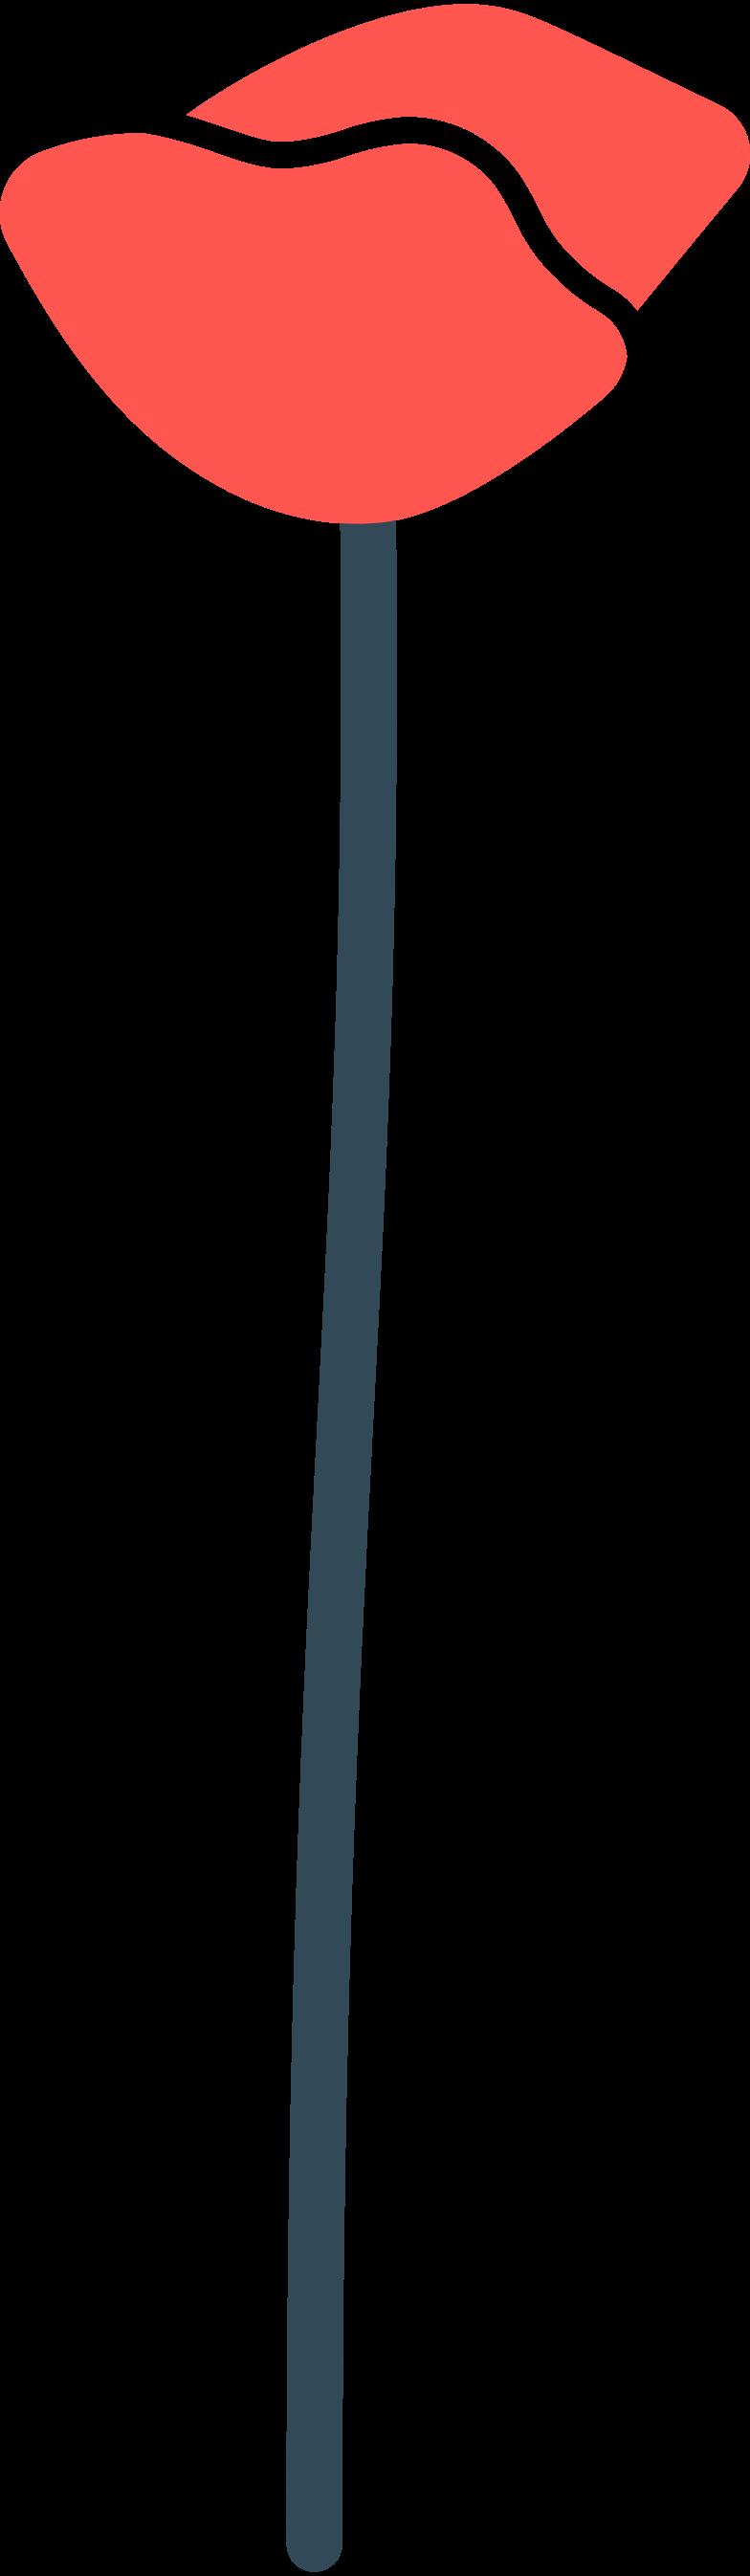 poppy Clipart illustration in PNG, SVG